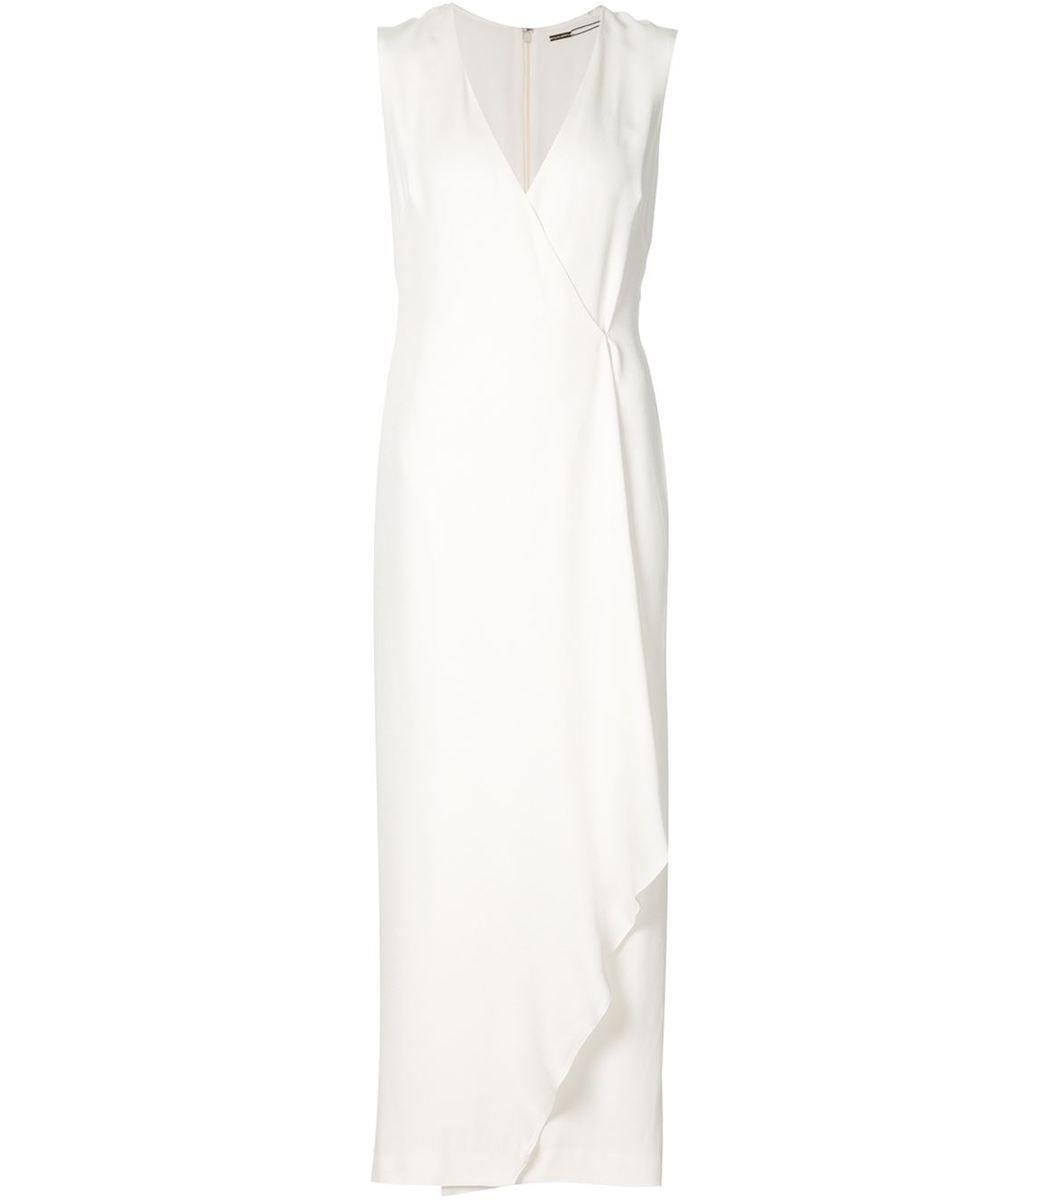 Adam Lippes White Silk Wrap Dress